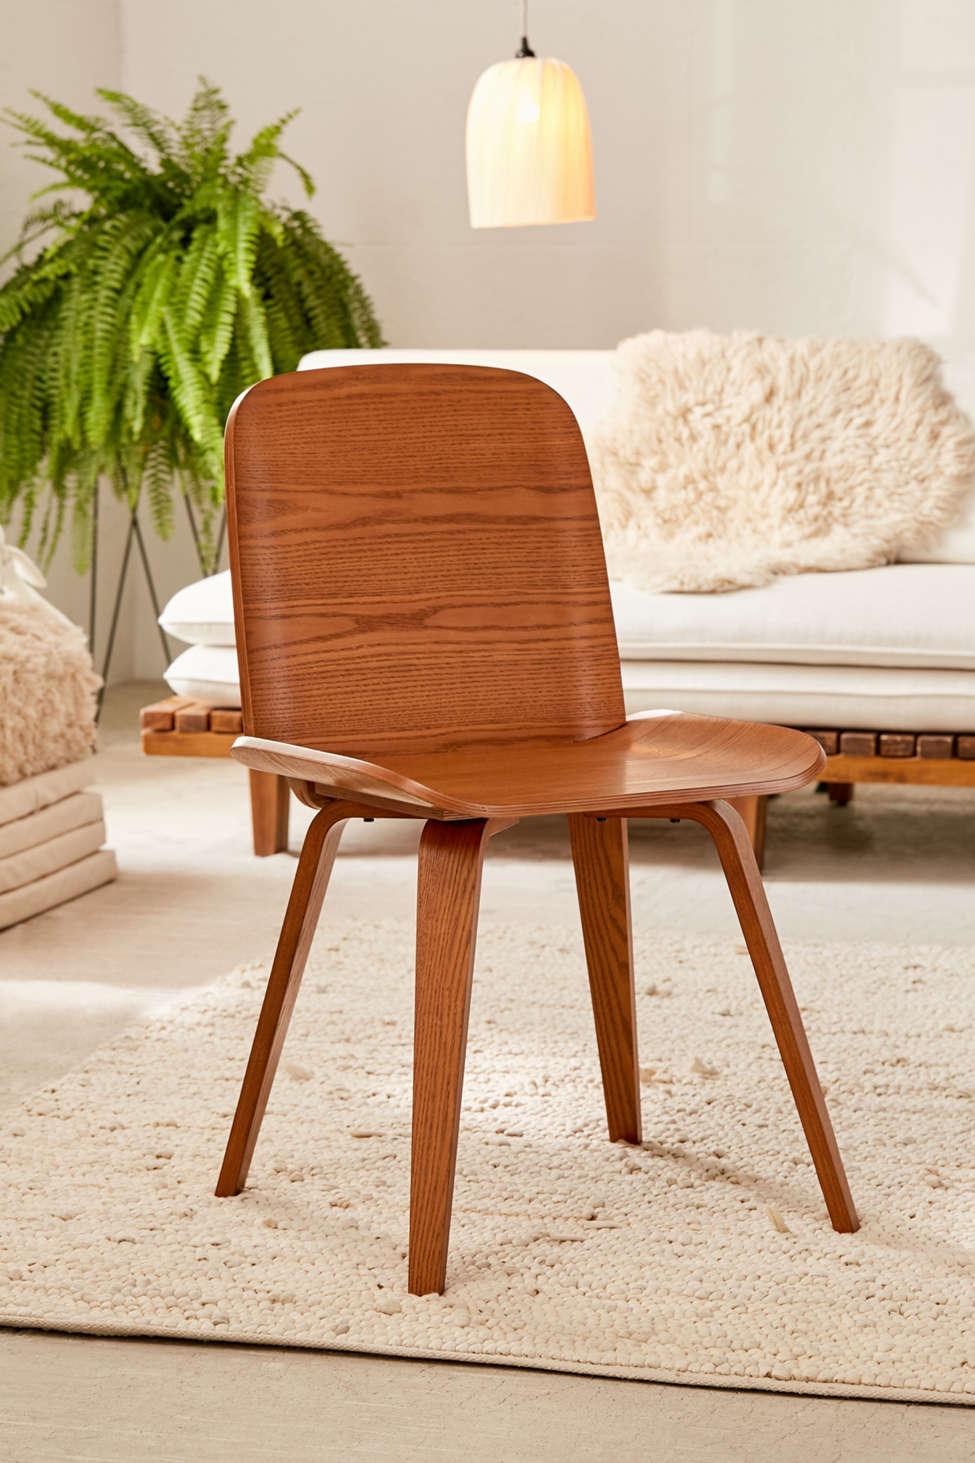 Slide View: 1: Miyu Wooden Chair